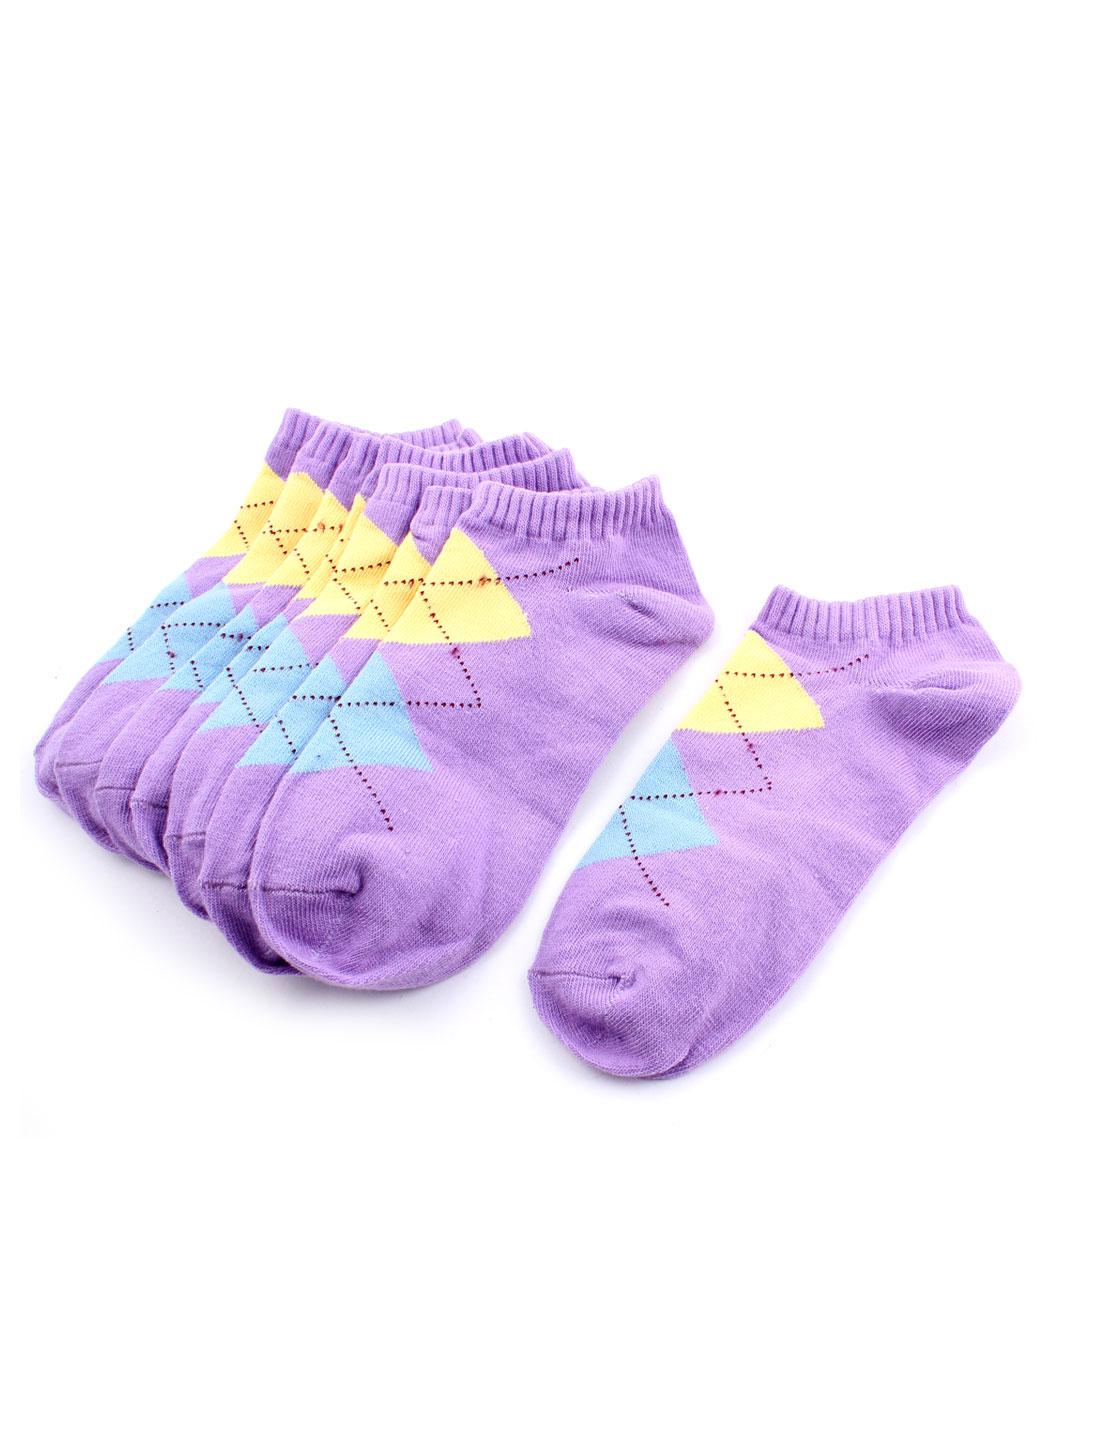 Woman Lady Argyle Pattern Elastic Cuff Low Cut Short Ankle Socks Purple 4 Pairs